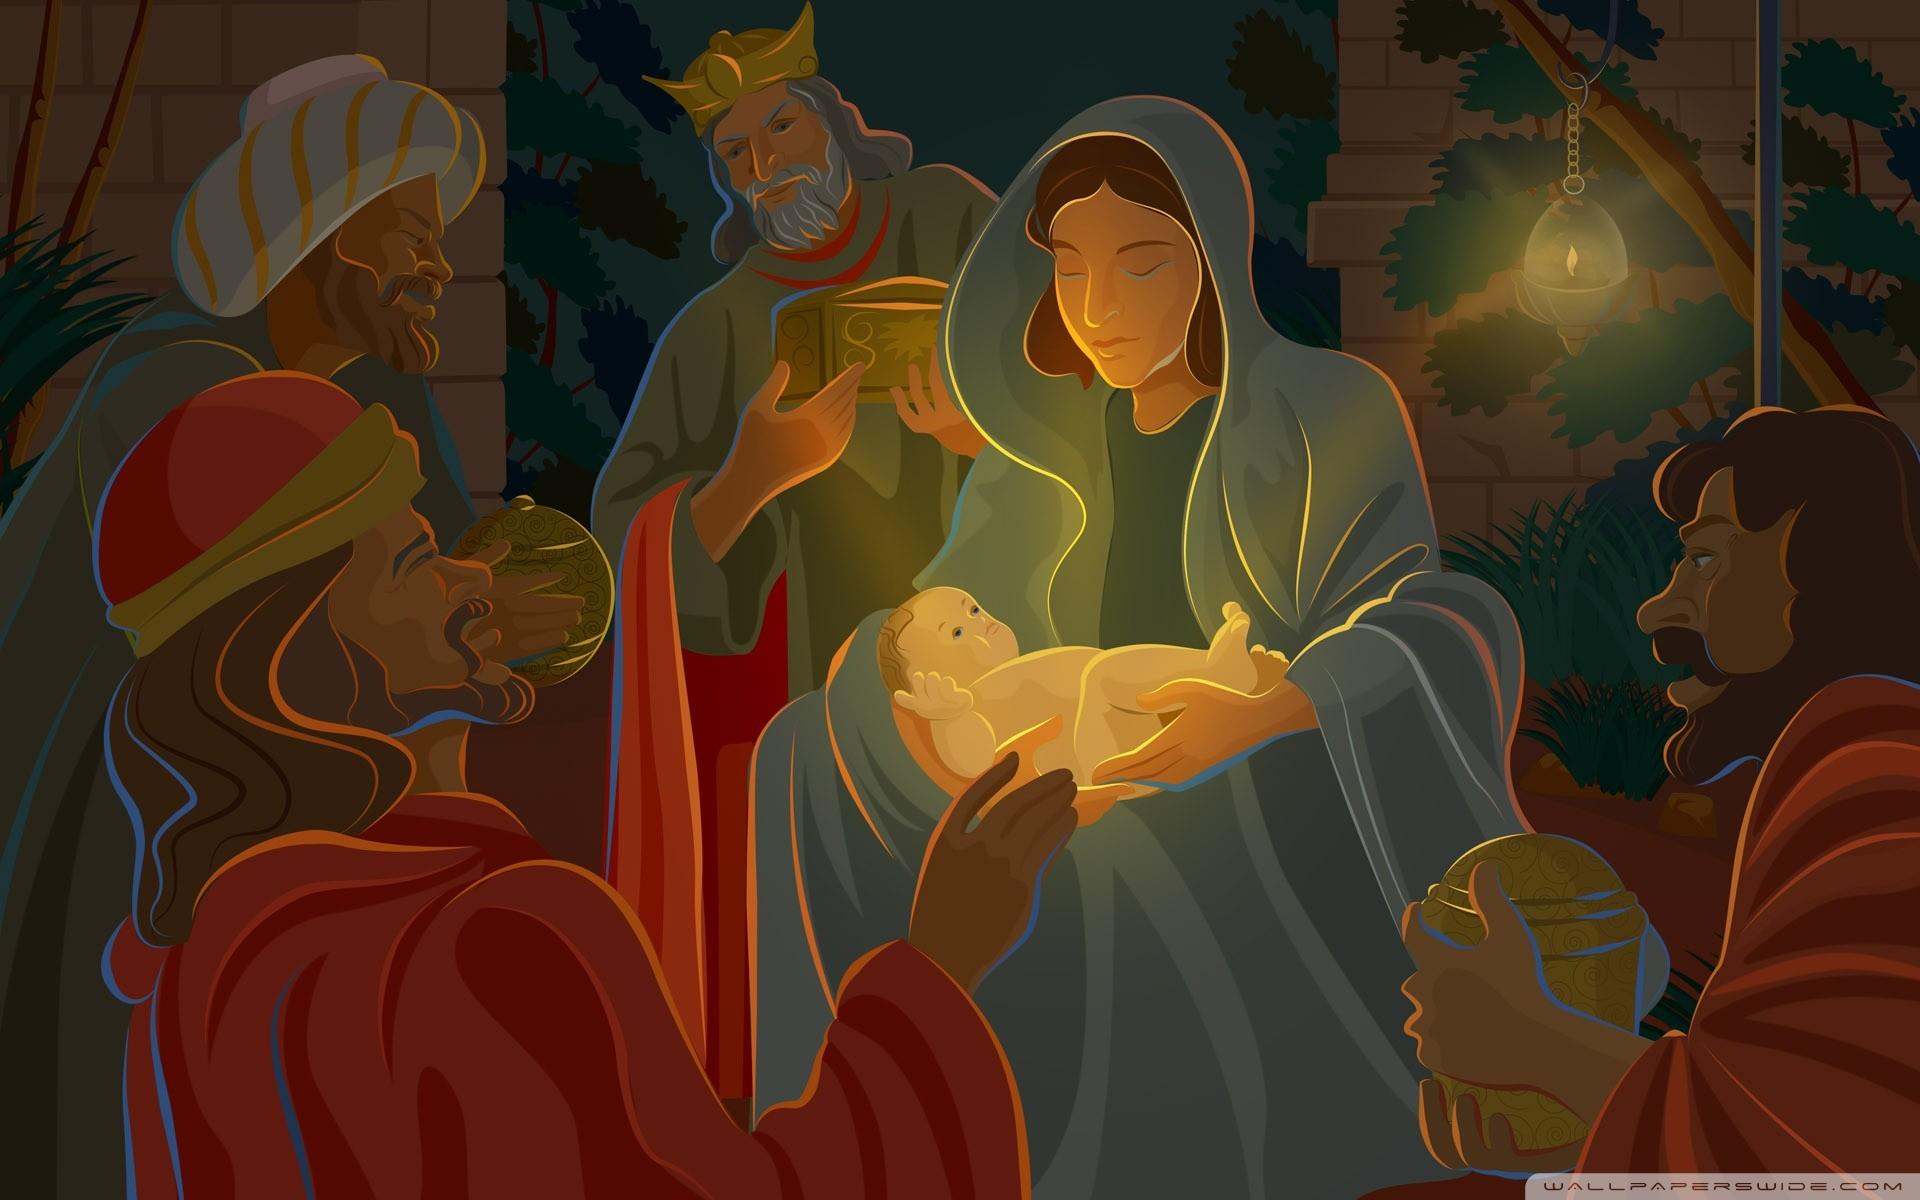 Festive Christmas CG – Digital Christmas illustration – Illustration – Nativity  scene – The Birth of Jesus 25